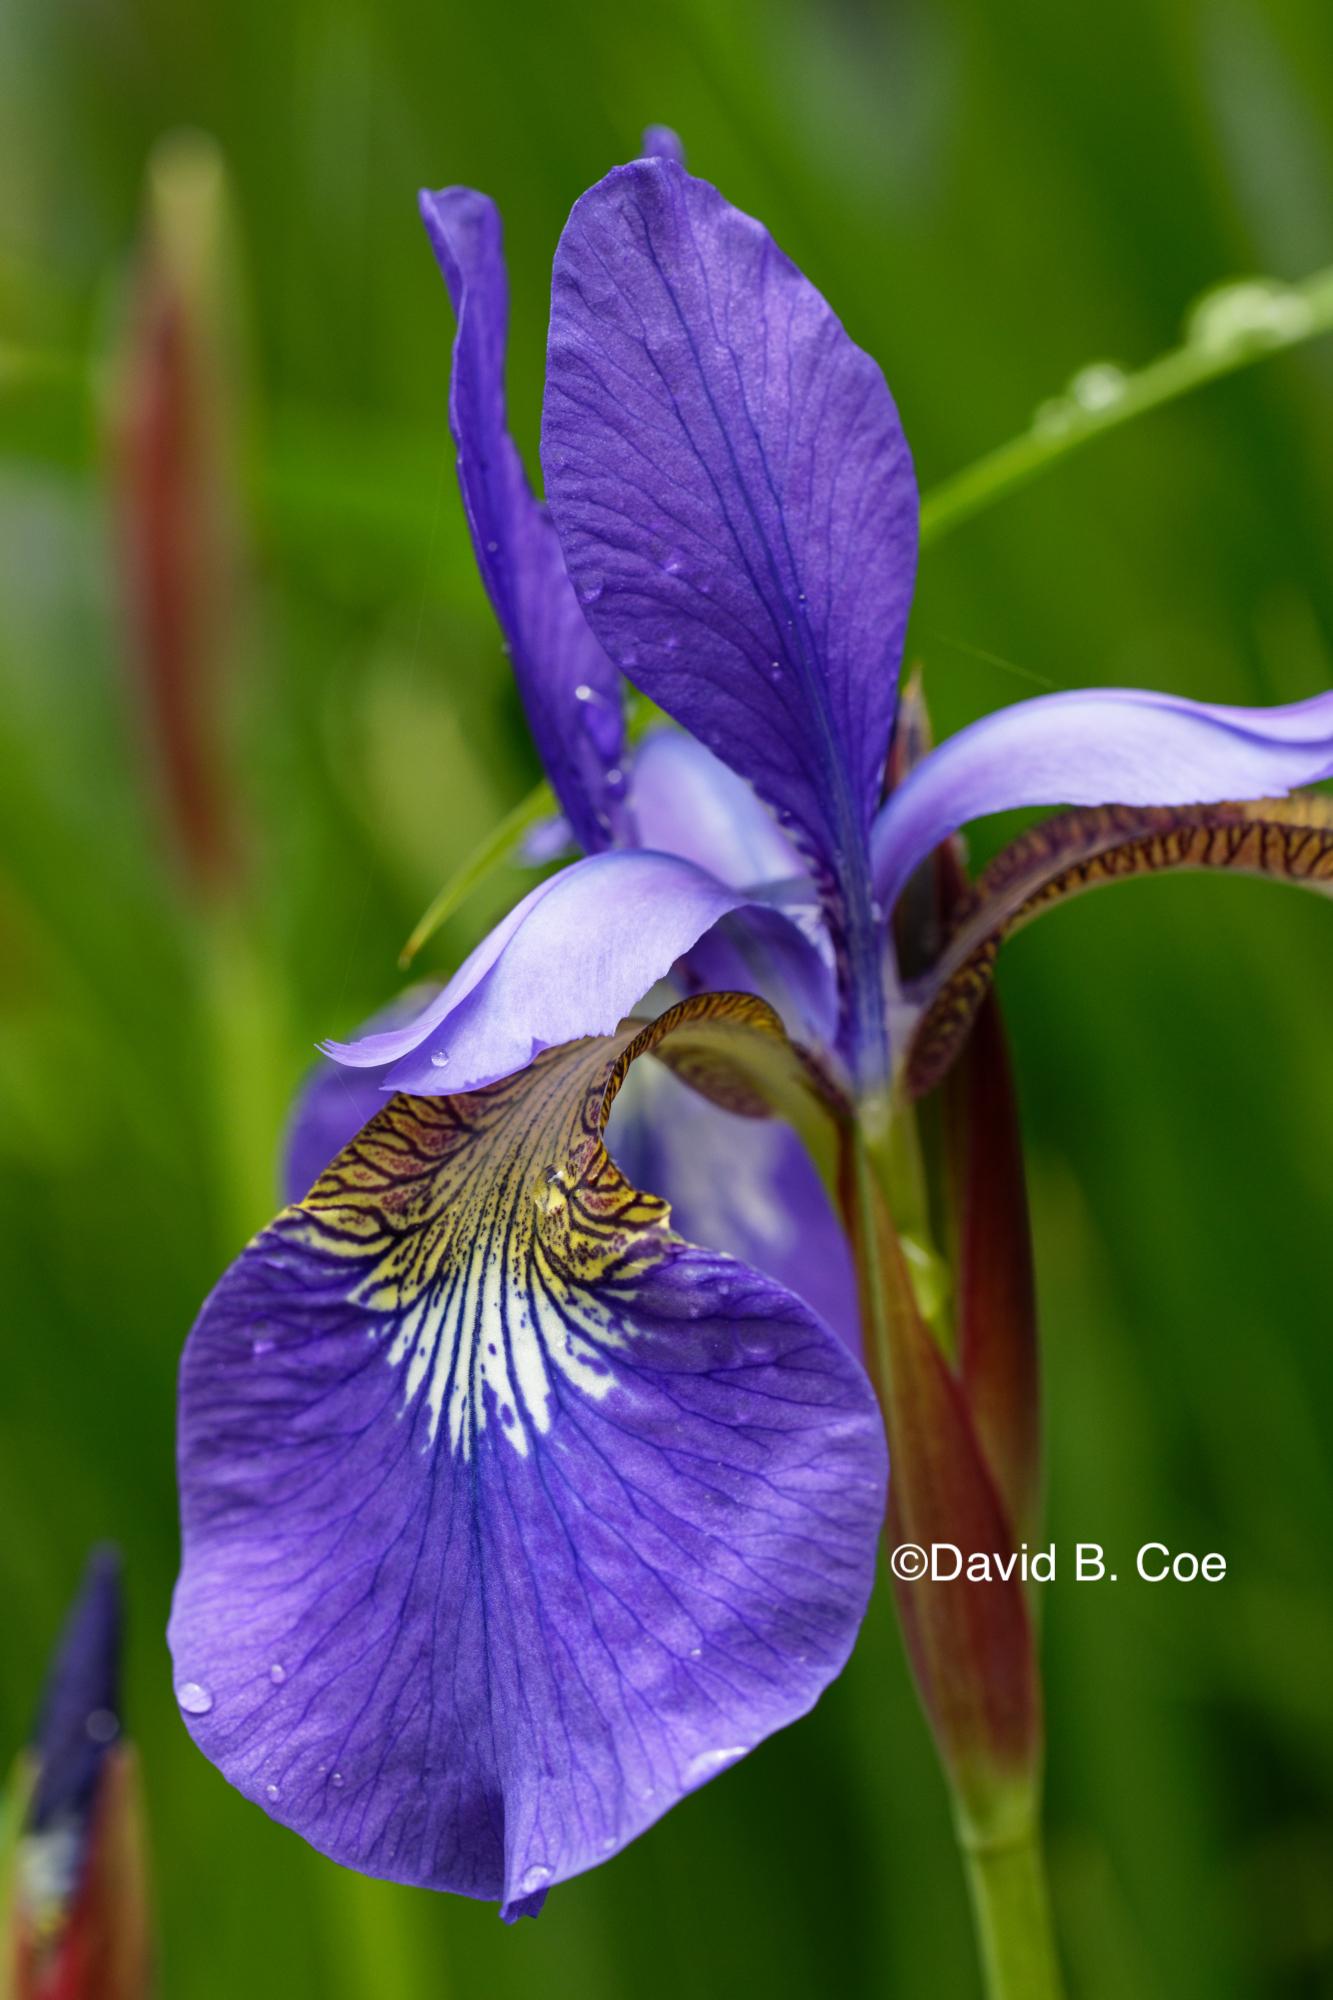 Japanese Iris II, by David B. Coe